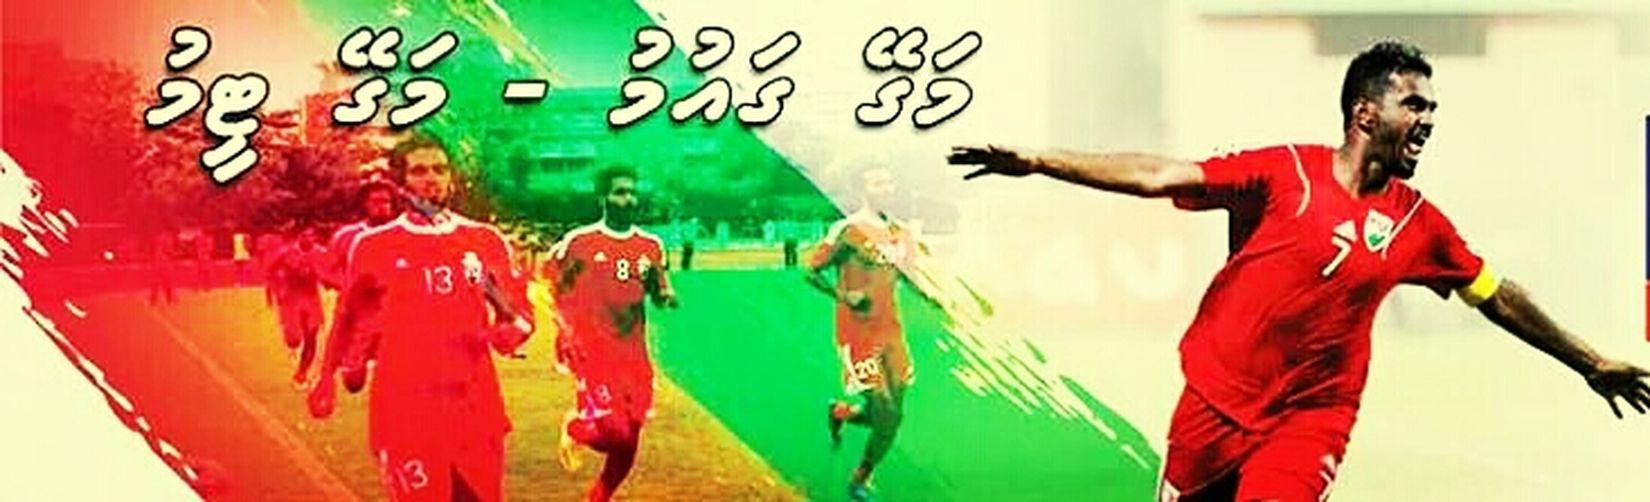 AFCChallengeCup2014 Maldives Yageen We Are Maldives